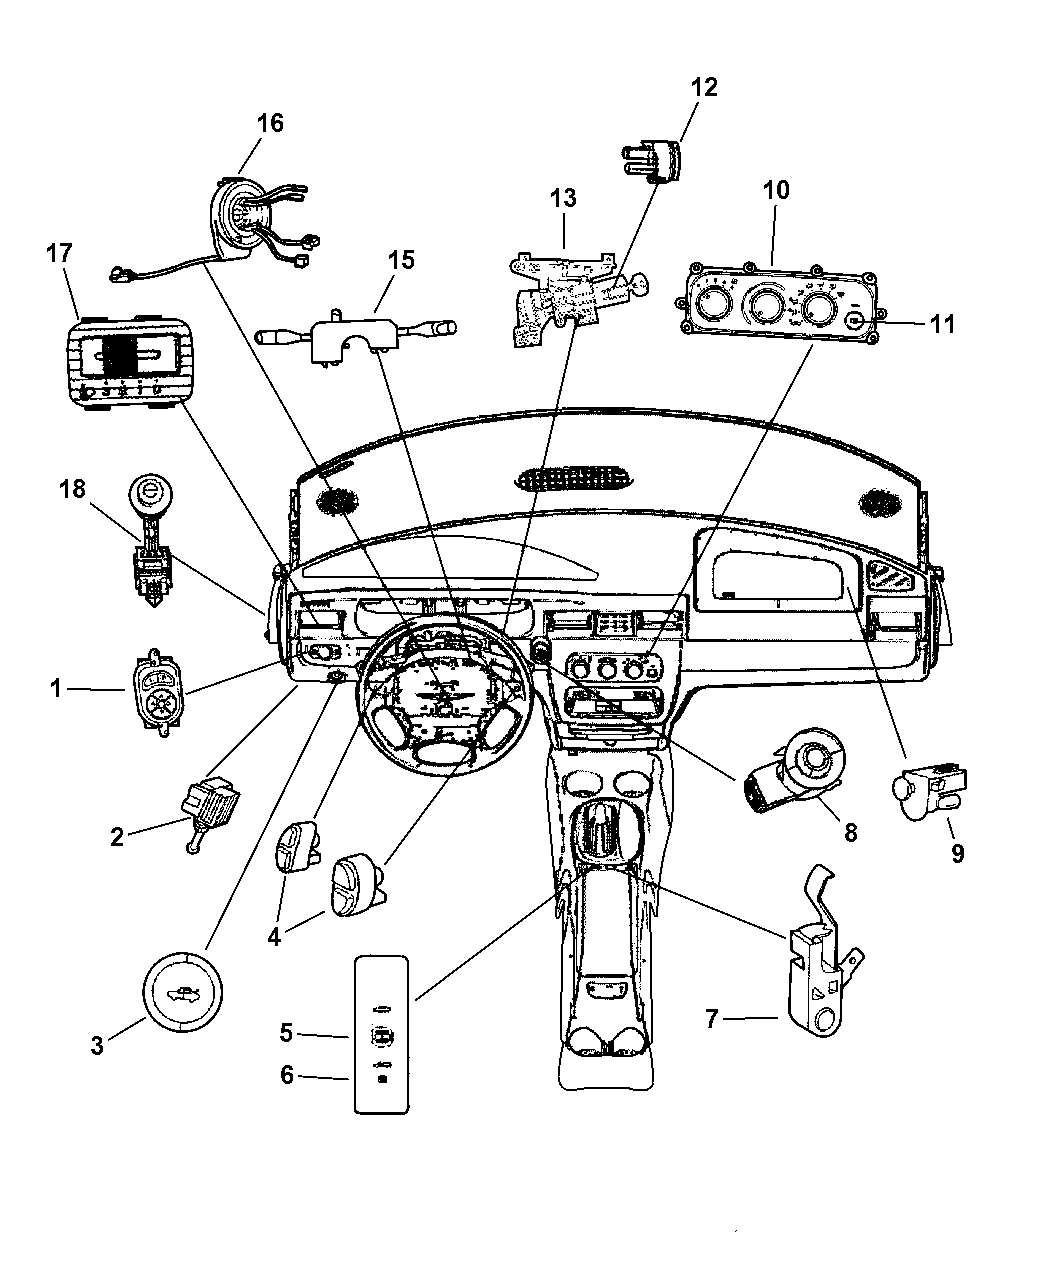 2002 Chrysler Sebring Sedan & Convertible Switches